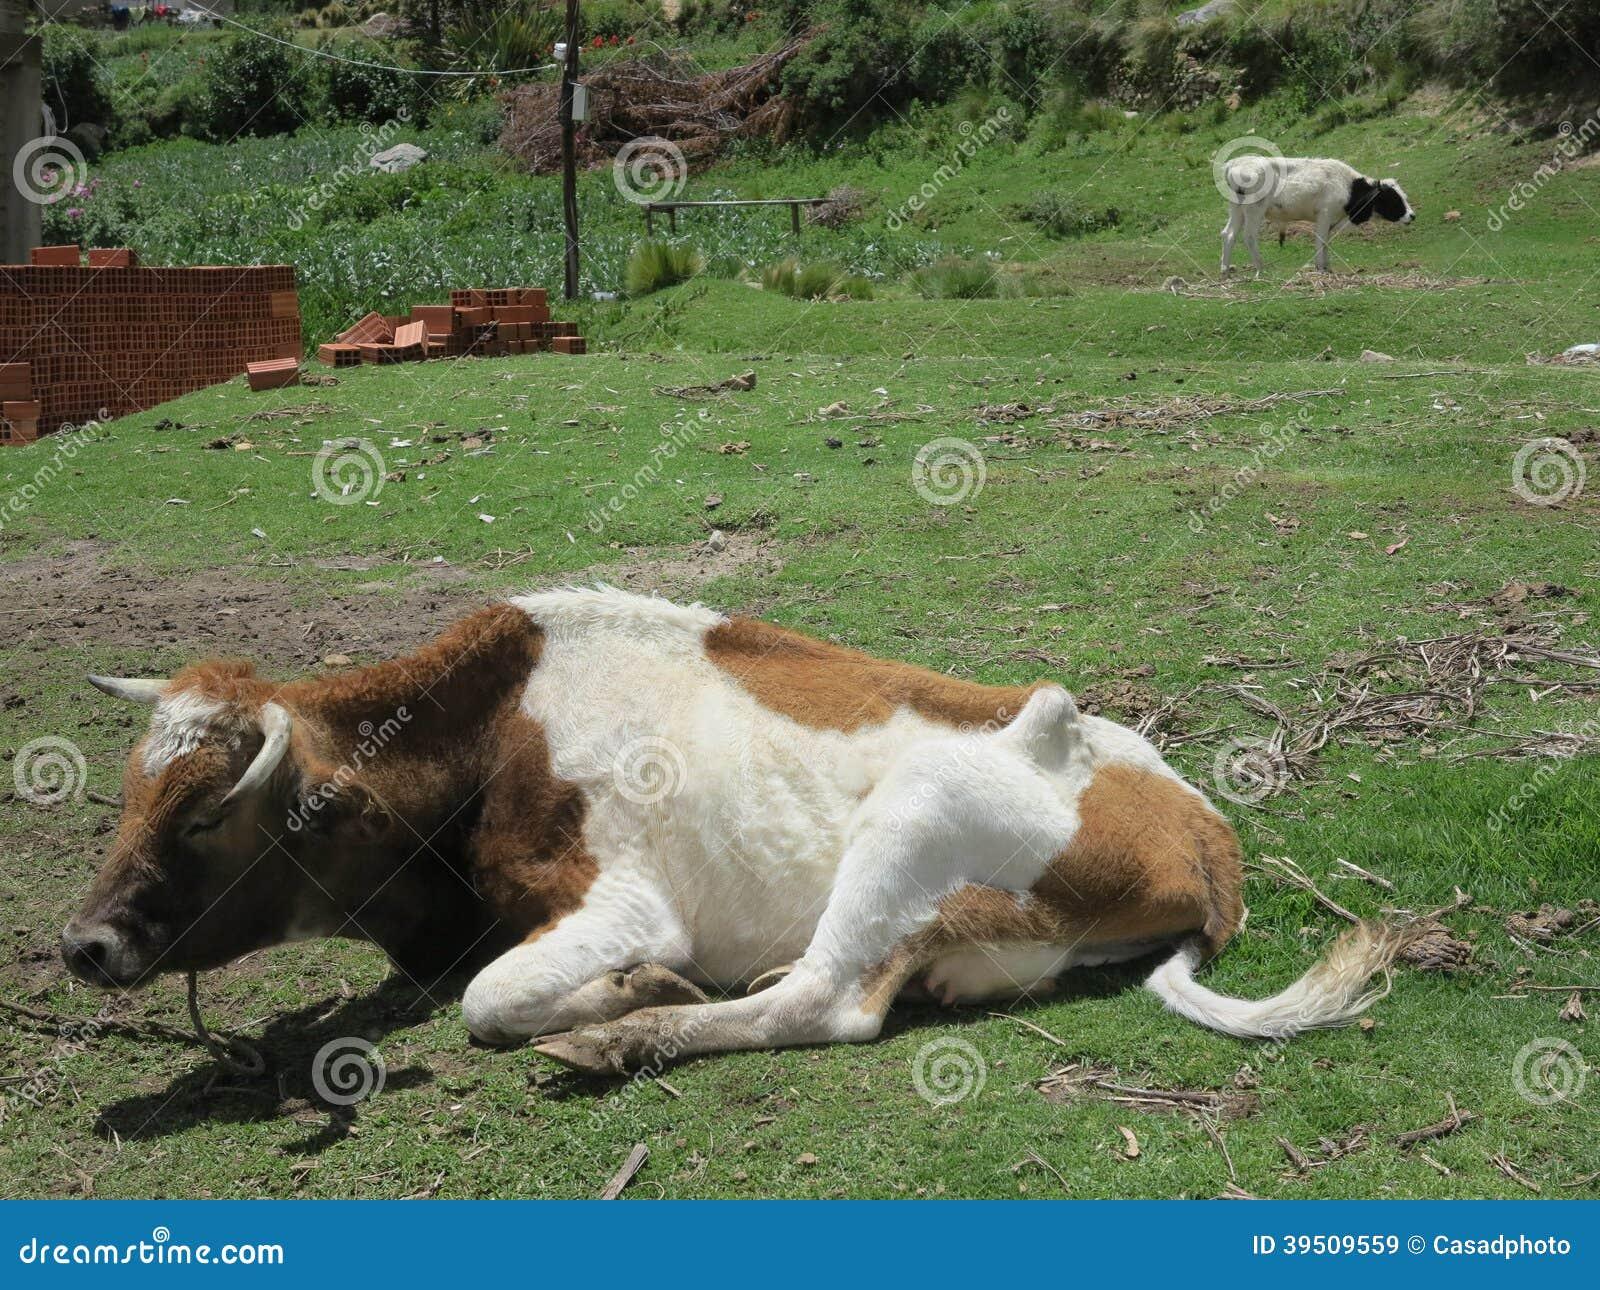 Cow in copacabana, titicaca lake